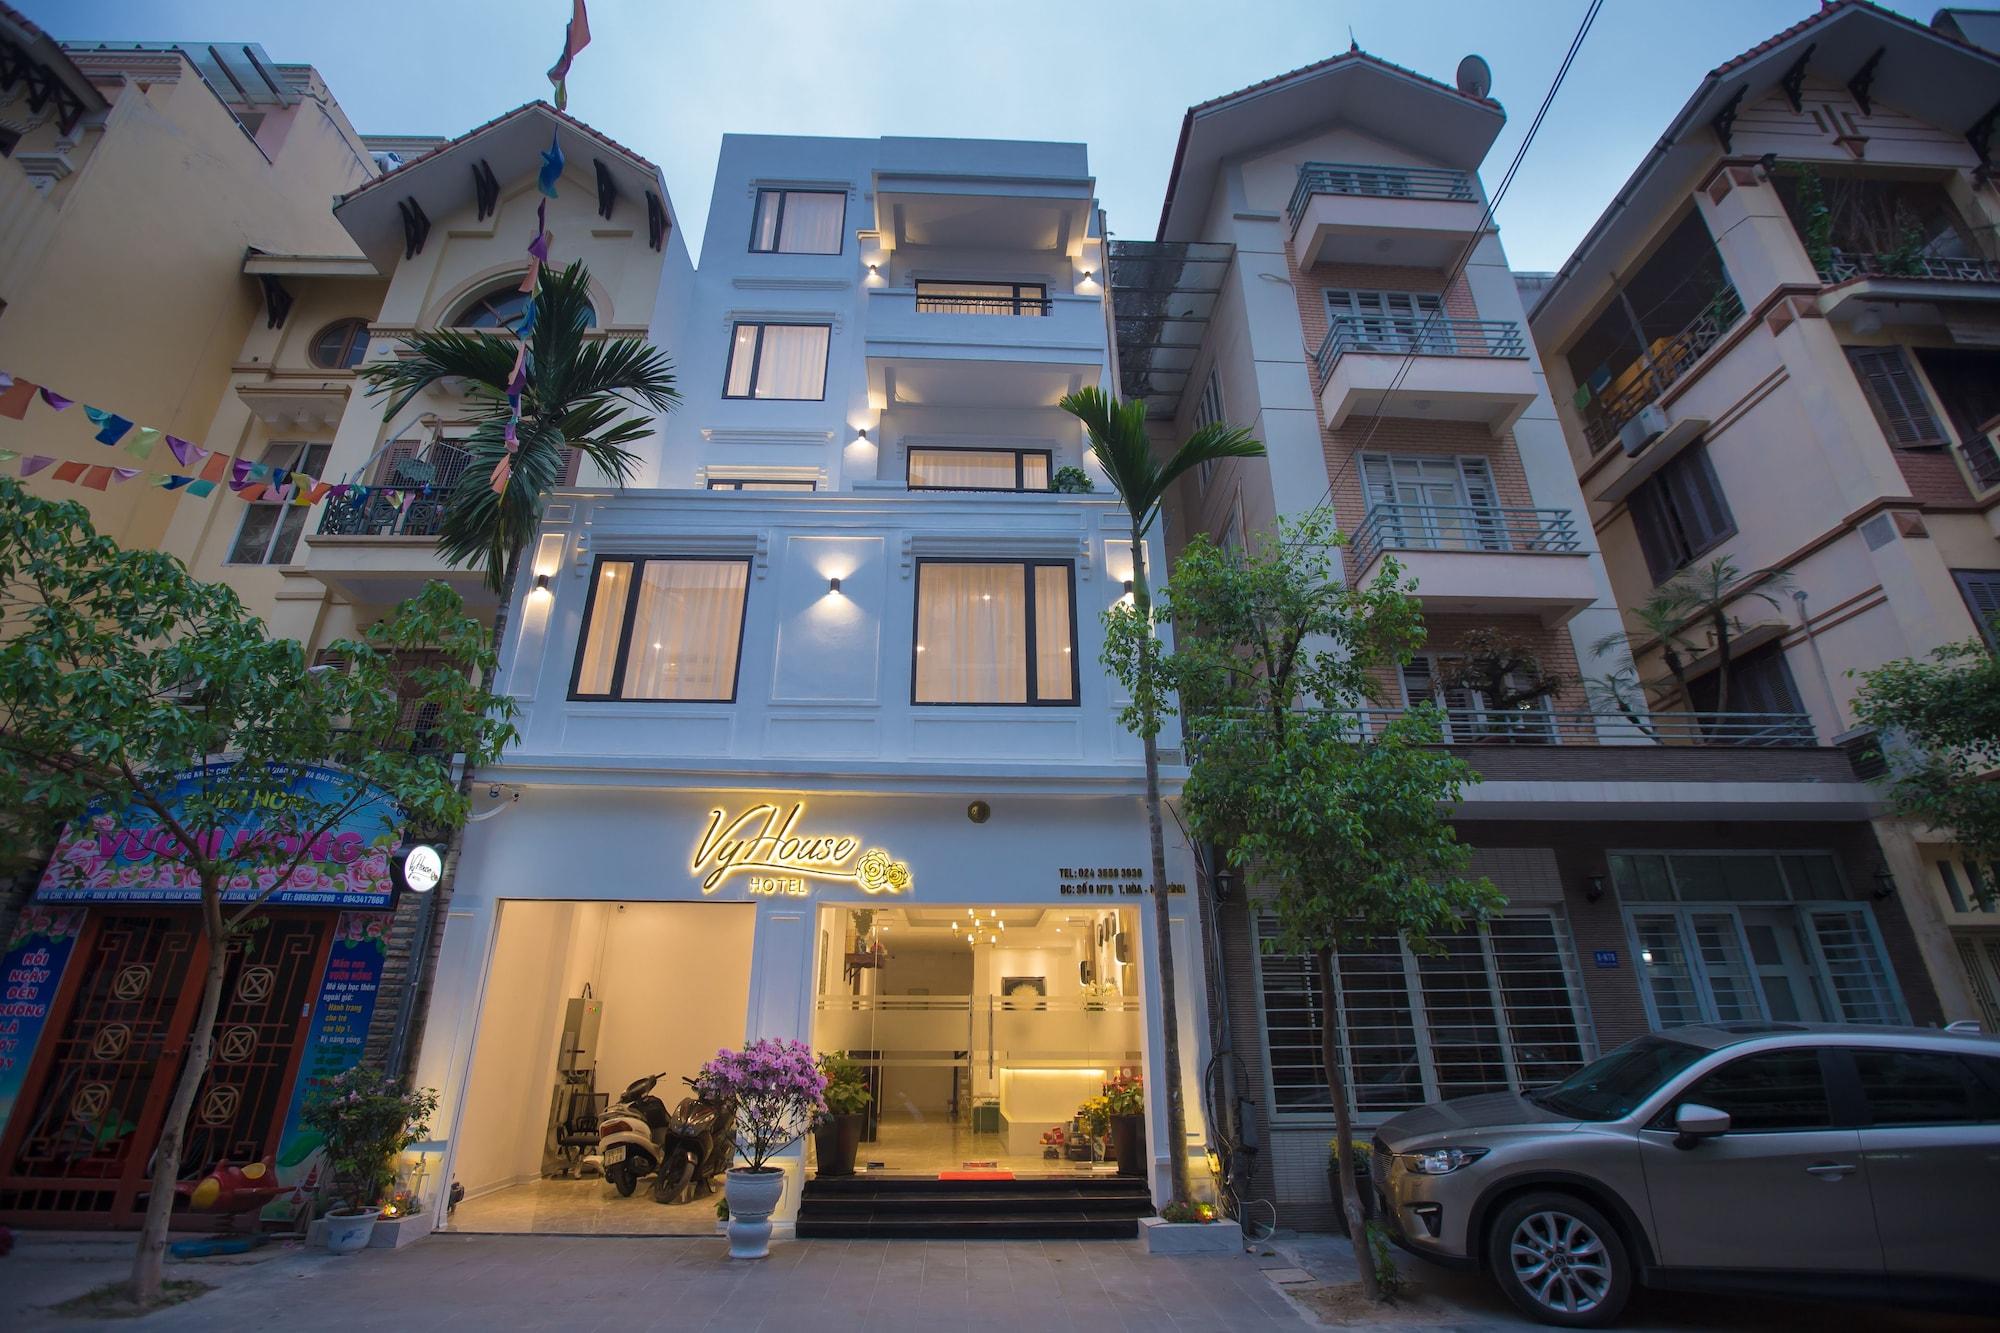 Vyhouse Hanoi Hotel, Thanh Xuân